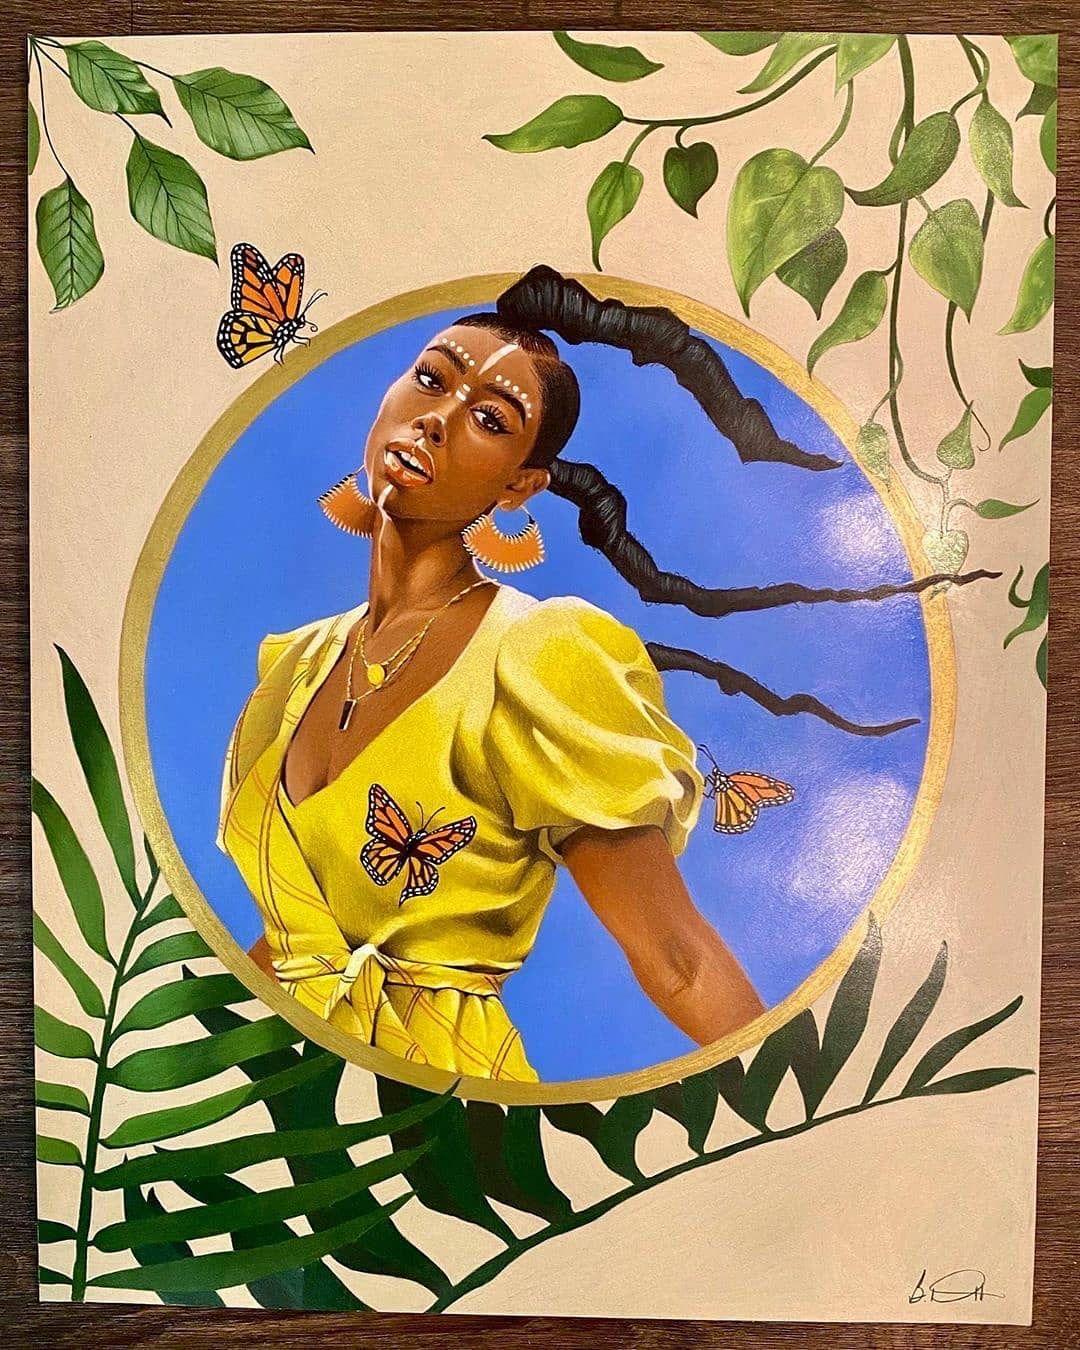 Love Black Art 🎨 Blissful Reflection... Swipe ➡️ for the process. 🎨 #Dopeblackart by @fresh_affiliate #photography #art #blackart #artoftheday #artfeature #artdaily #igart #digitaldrawing #realisticdrawing #pencildrawing #artspotlight #igartist #drawing #coolart #dopeart #blackartwork #artgallery #supportblackart #blackartist #coolartwork #artfido #artlife #artwork #dopeblackartist #dopeblackart #Artistatwork #dopeartistatwork